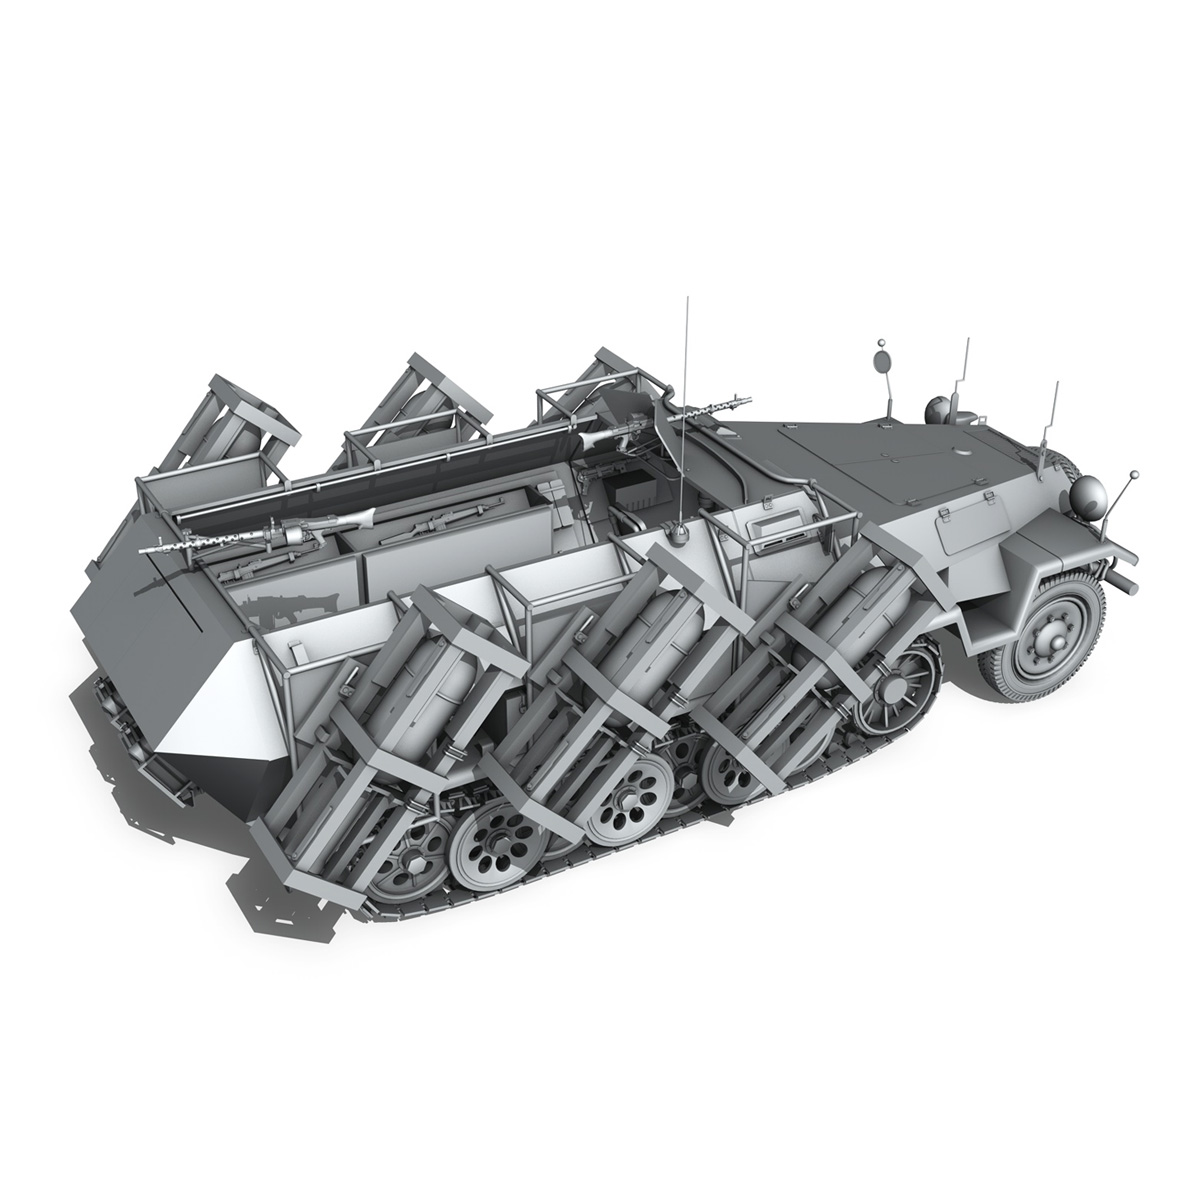 sdkfz 251 ausf.b – ground stuka 3d model 3ds fbx c4d lwo obj 251684